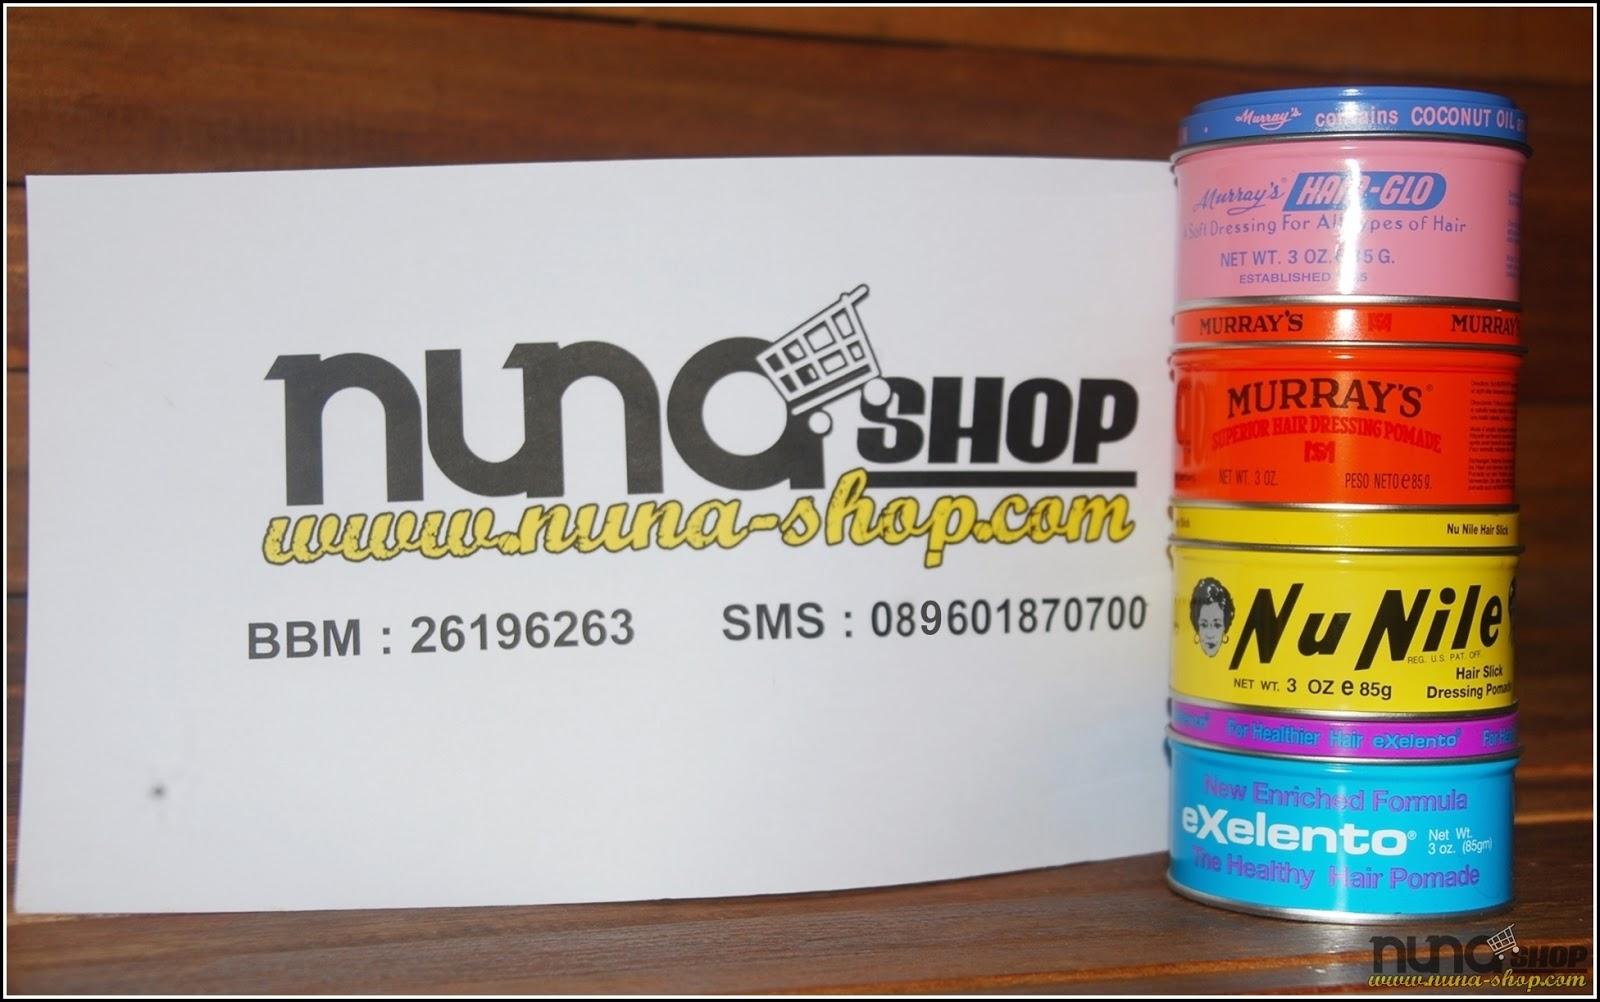 Minyak Rambut POMADE Murray's Nunile, Superlight, Exelento, Hair-Glo, Superior From US ( ASLI )